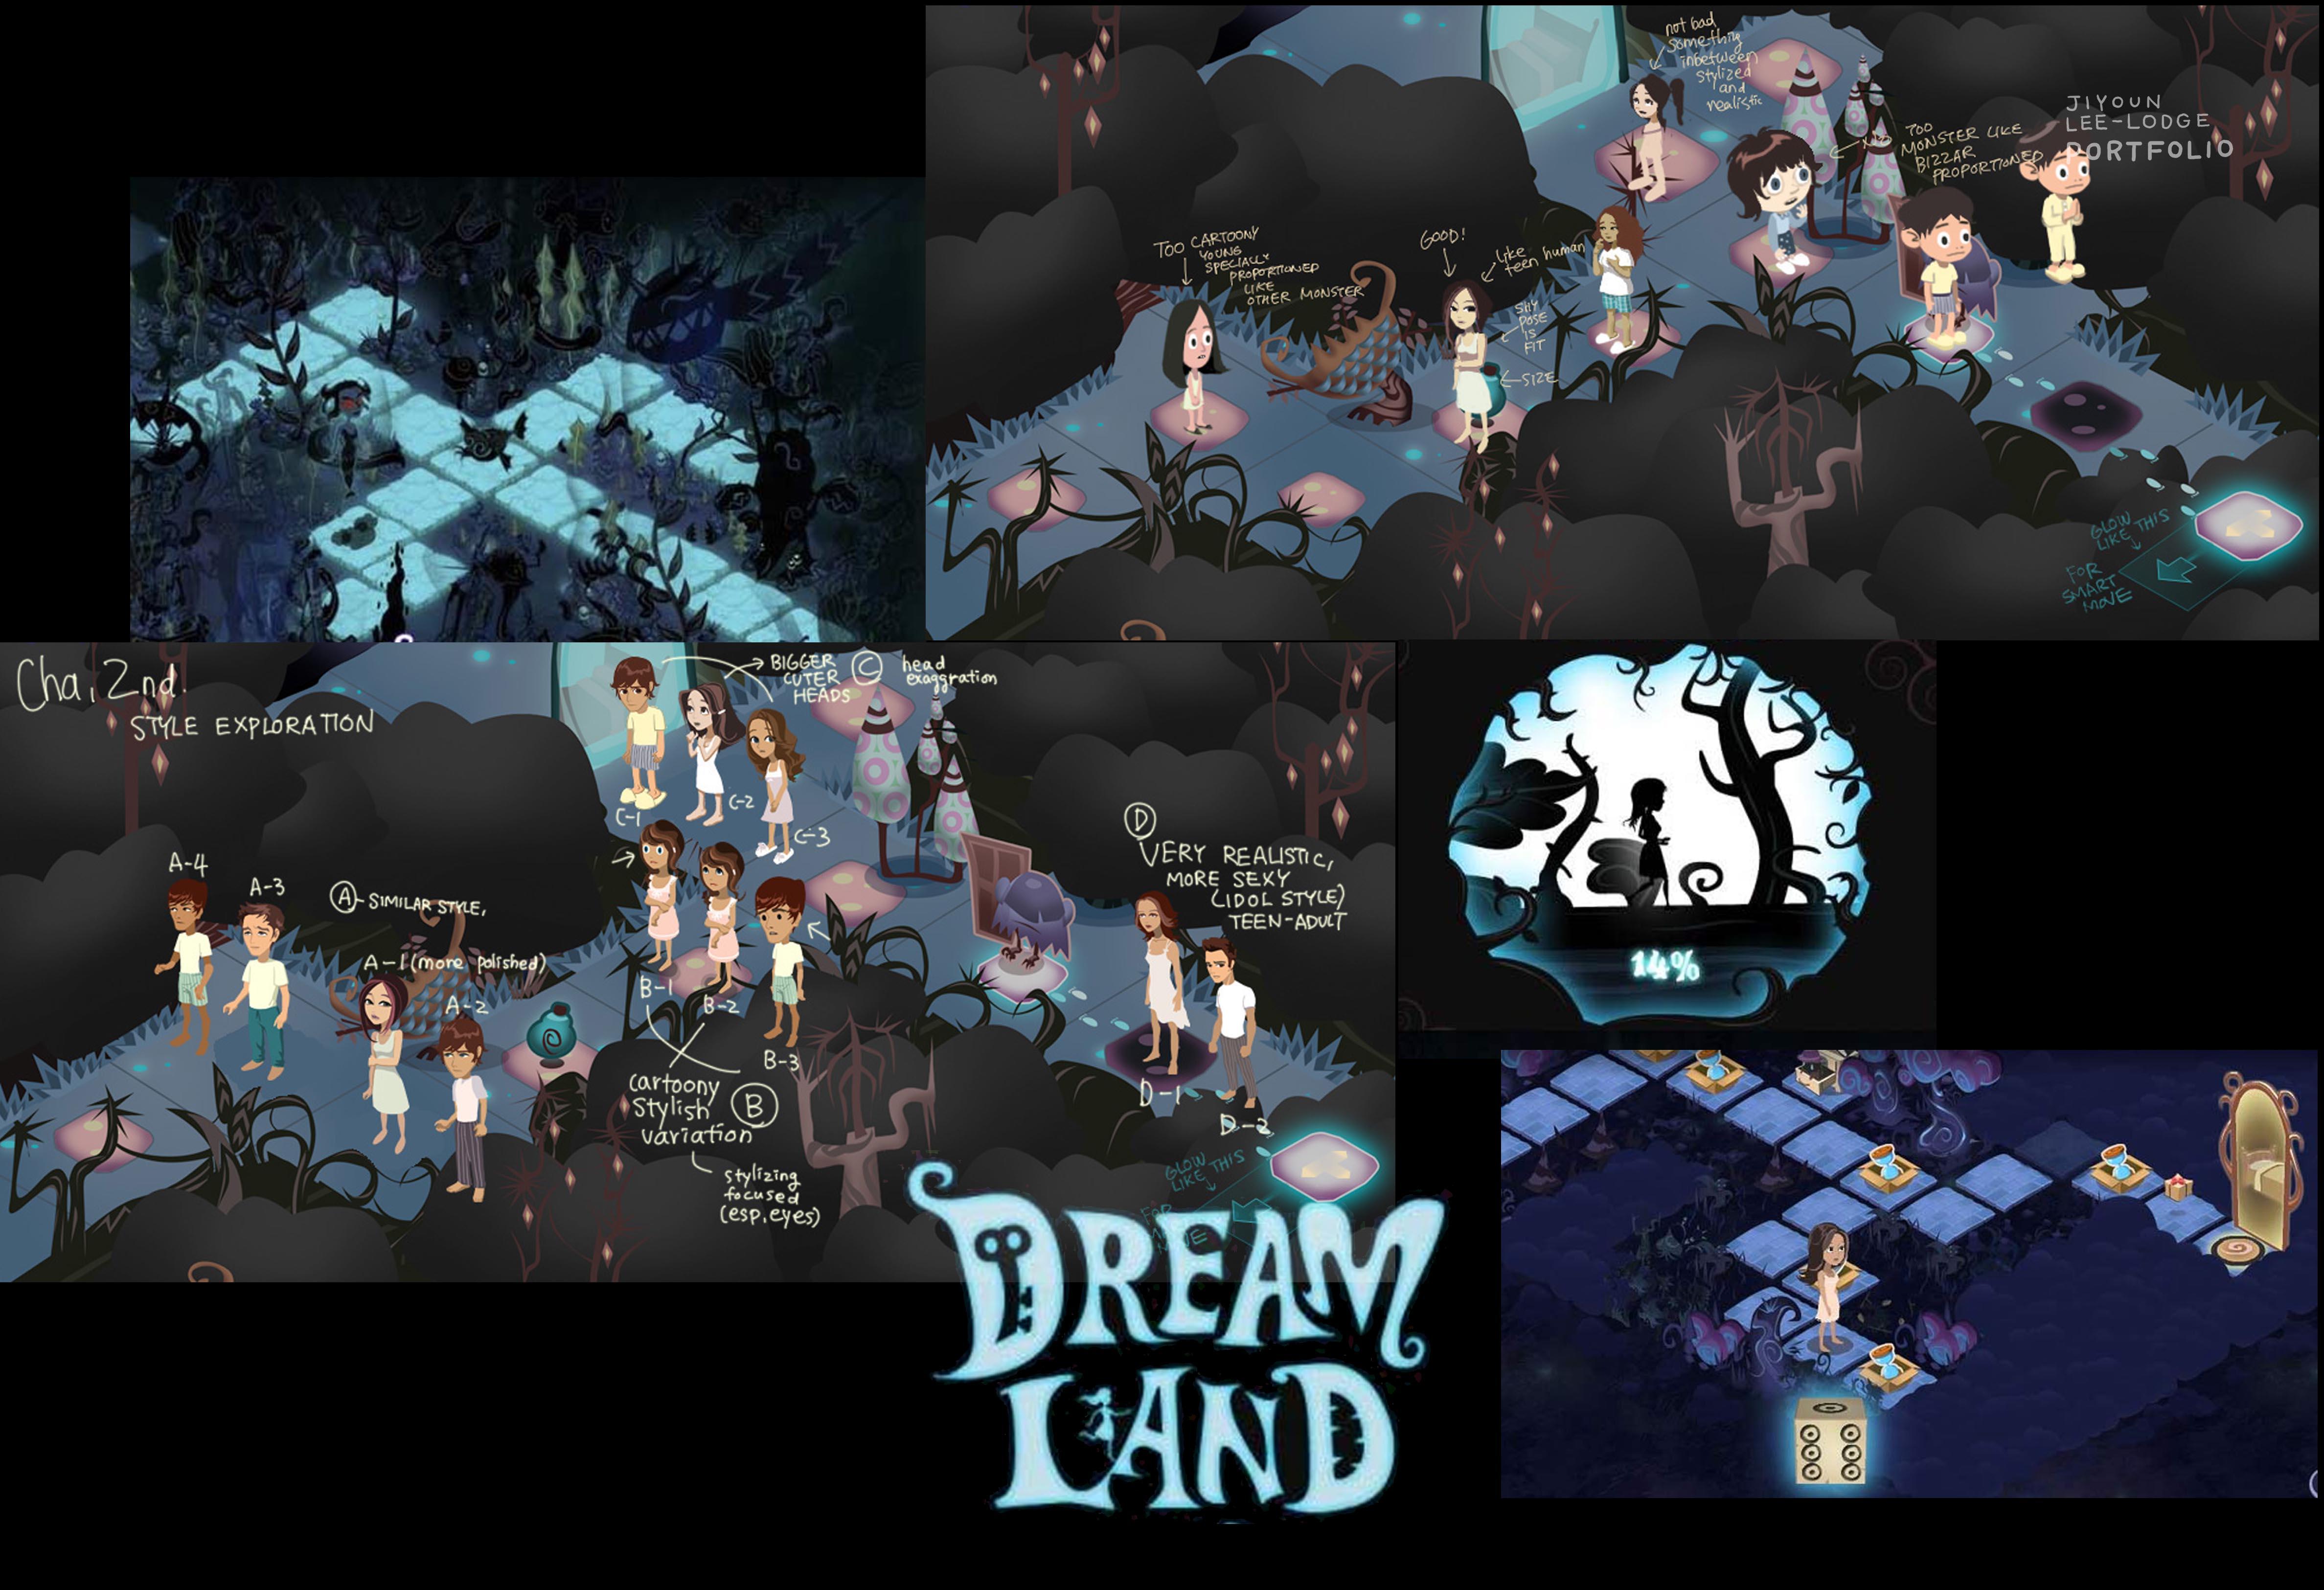 Dreamland_Freshplanet_1